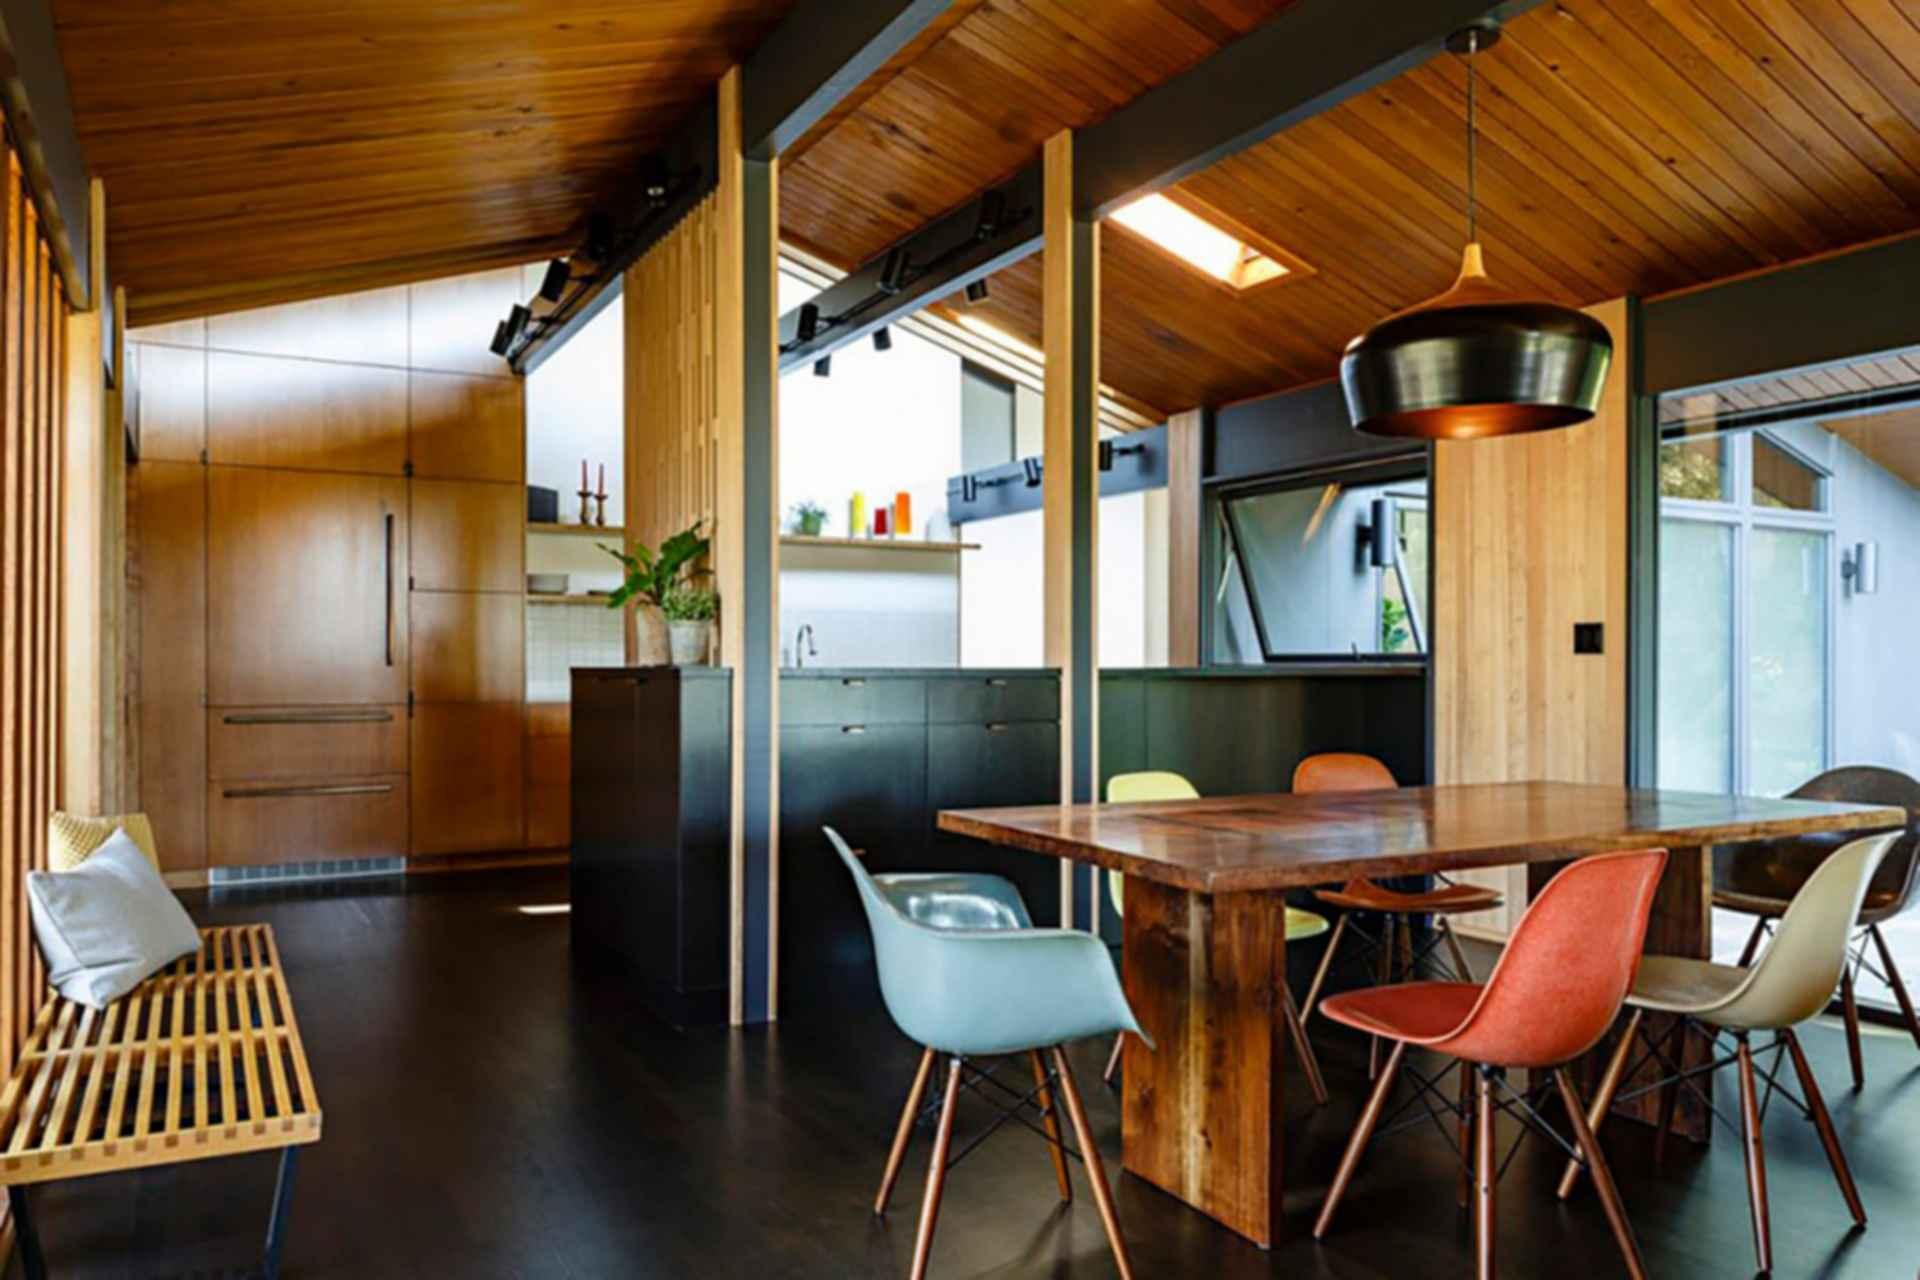 Feldman House - Interior/Dining Table